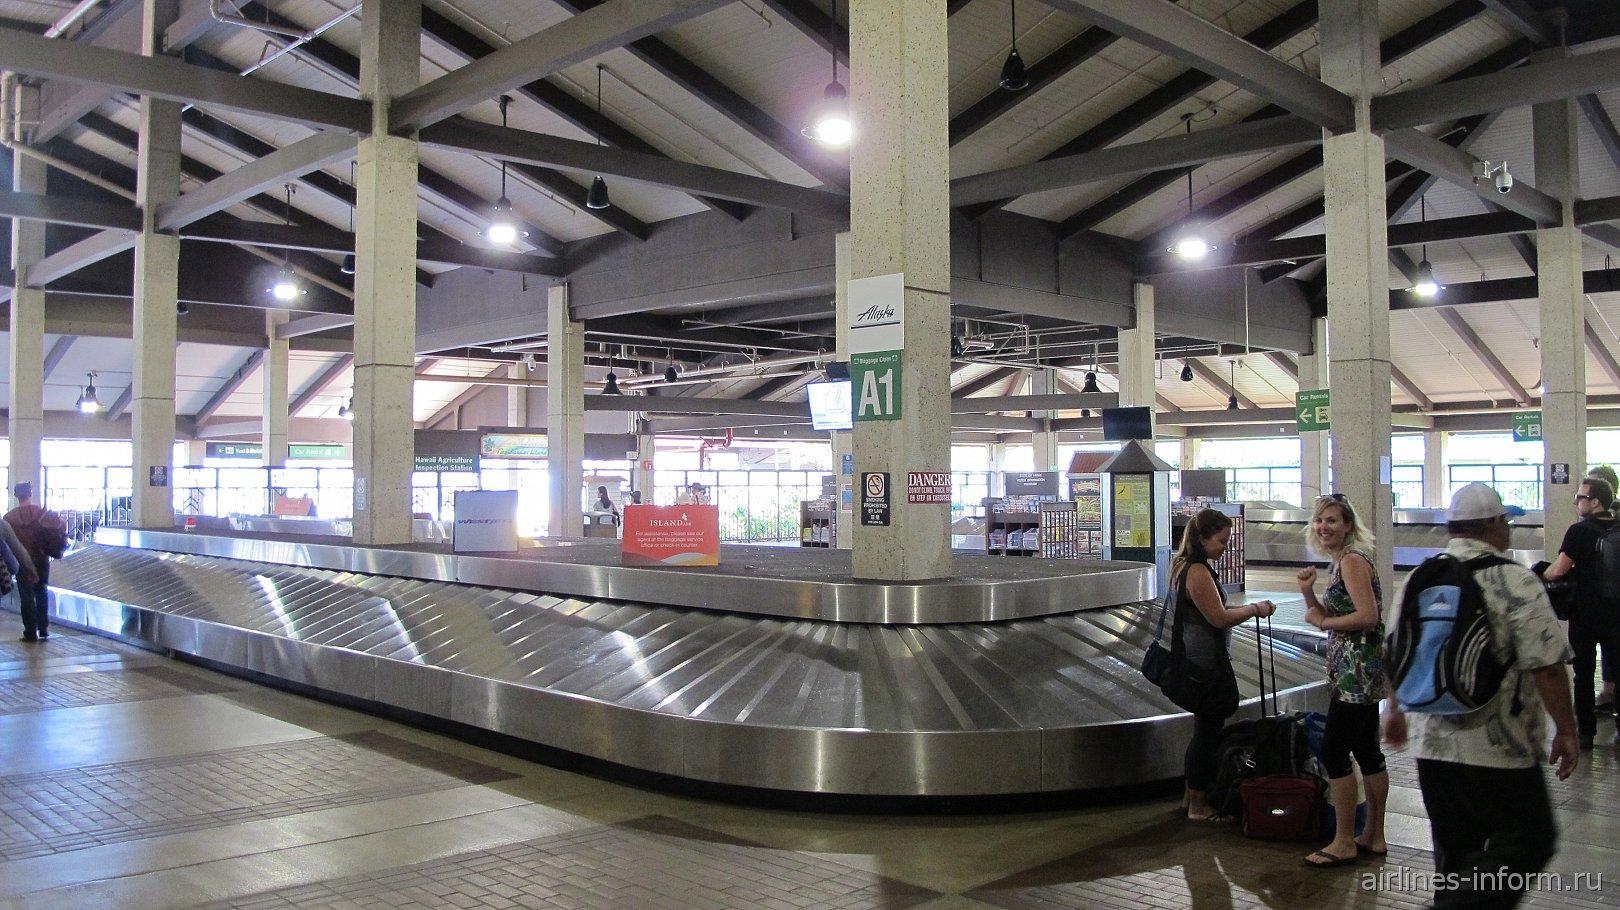 Зона выдачи багажа в аэропорту Лихуэ